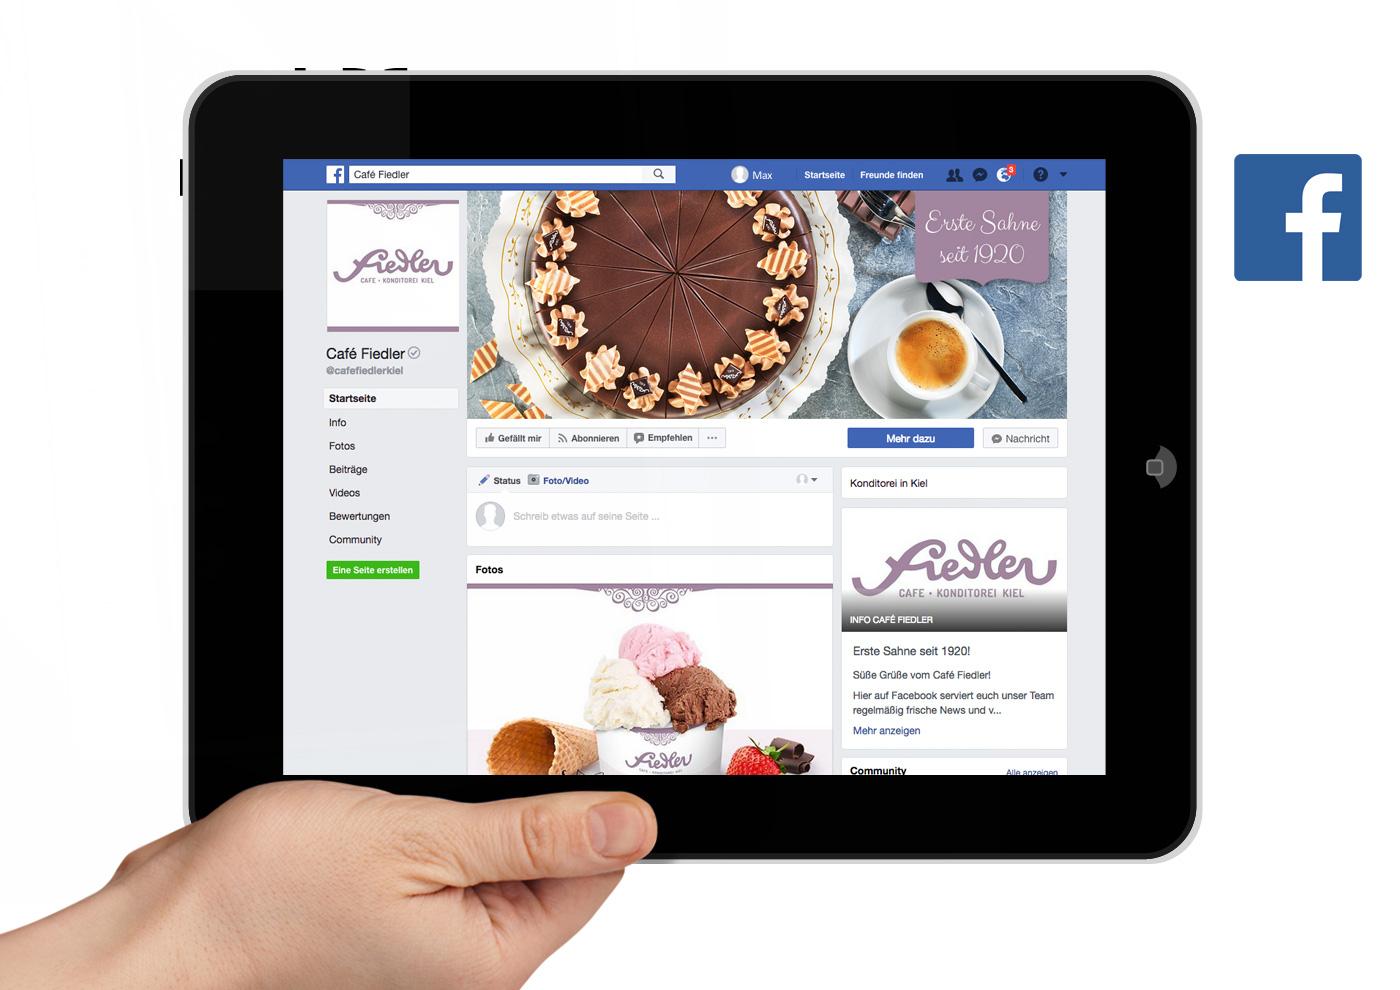 CD-Relaunch, Web und Social Media für Café Fiedler - Facebook